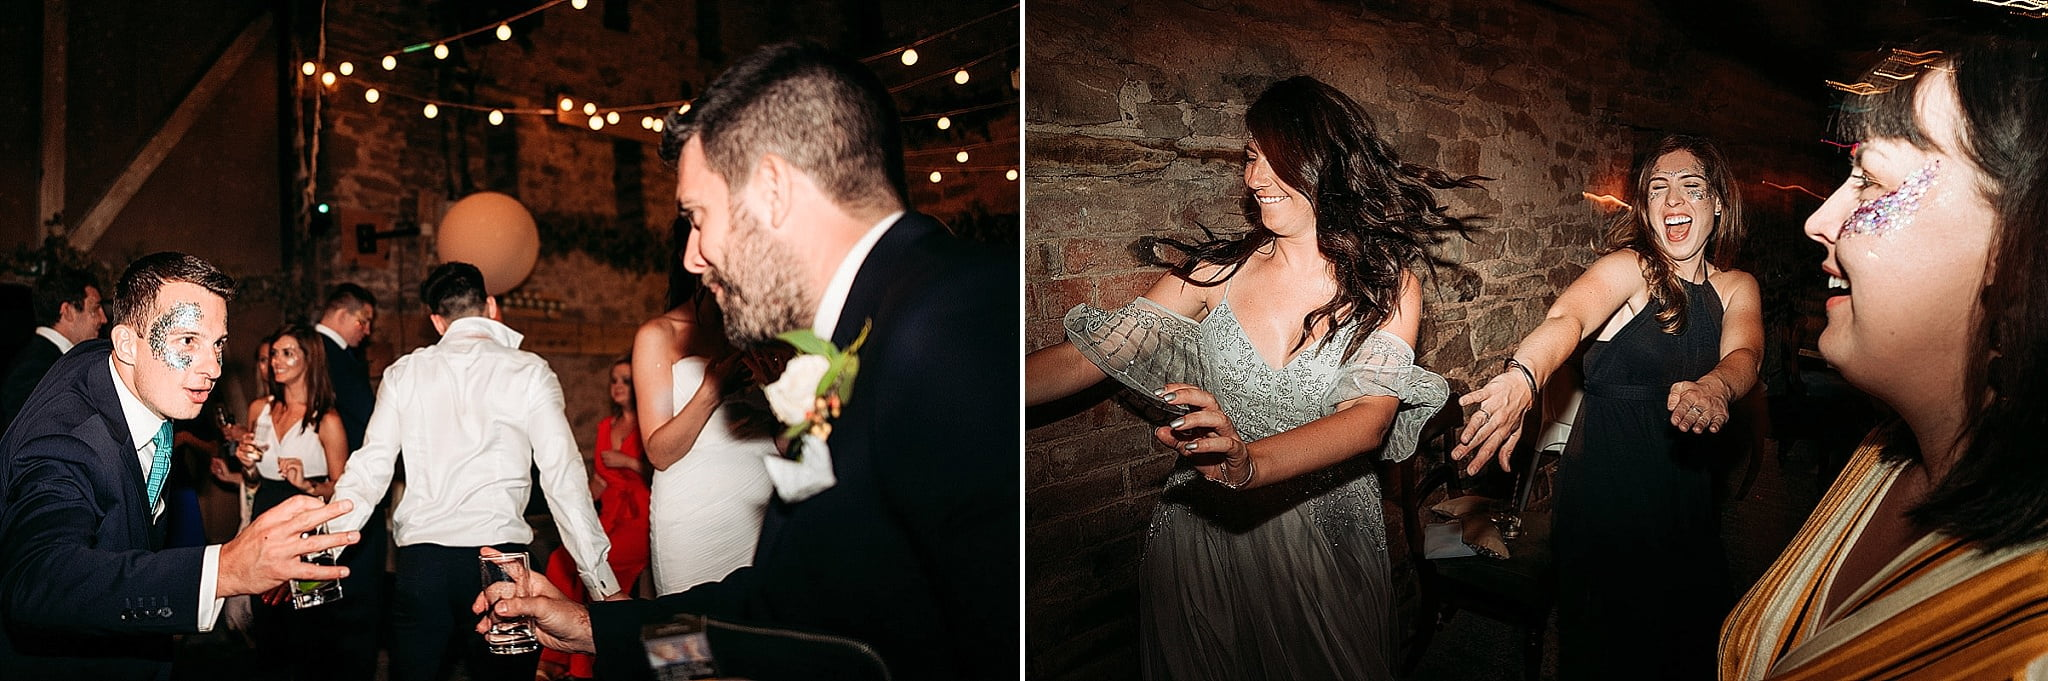 Lyde Court Wedding - Becky + Rhys 93